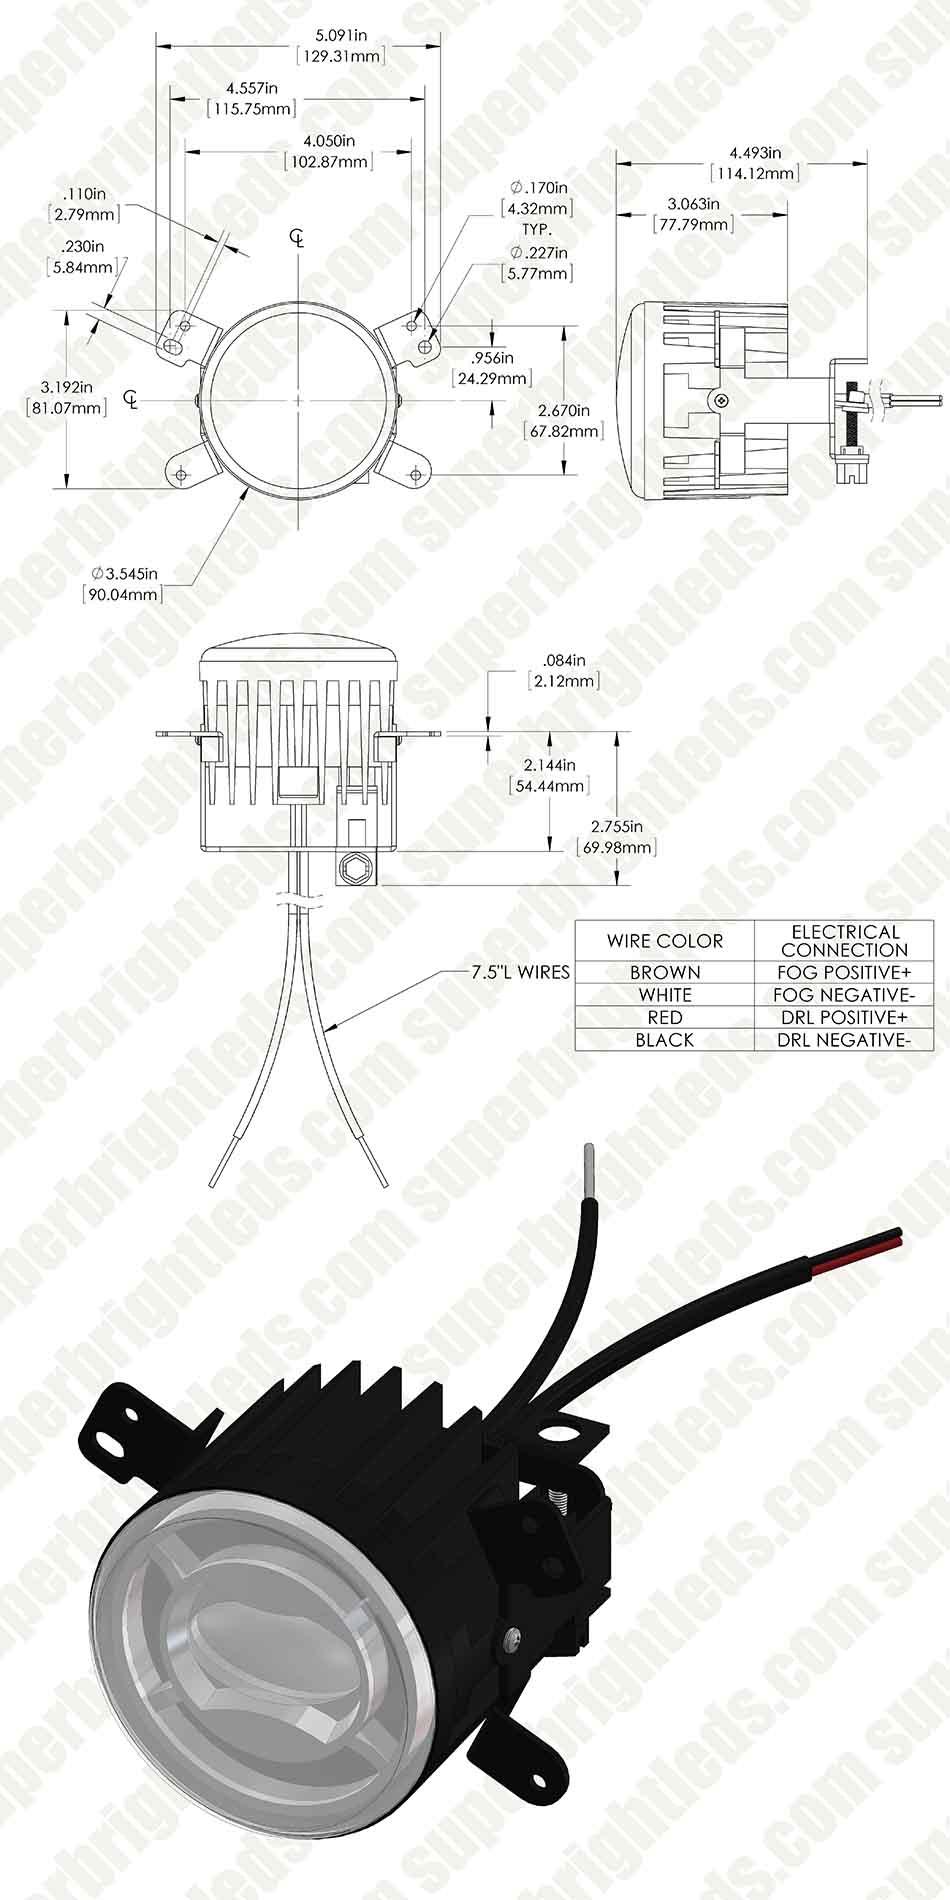 Superb Wrg 5047 Wiring Diagram For Led Daytime Running Lights Wiring Cloud Onicaxeromohammedshrineorg